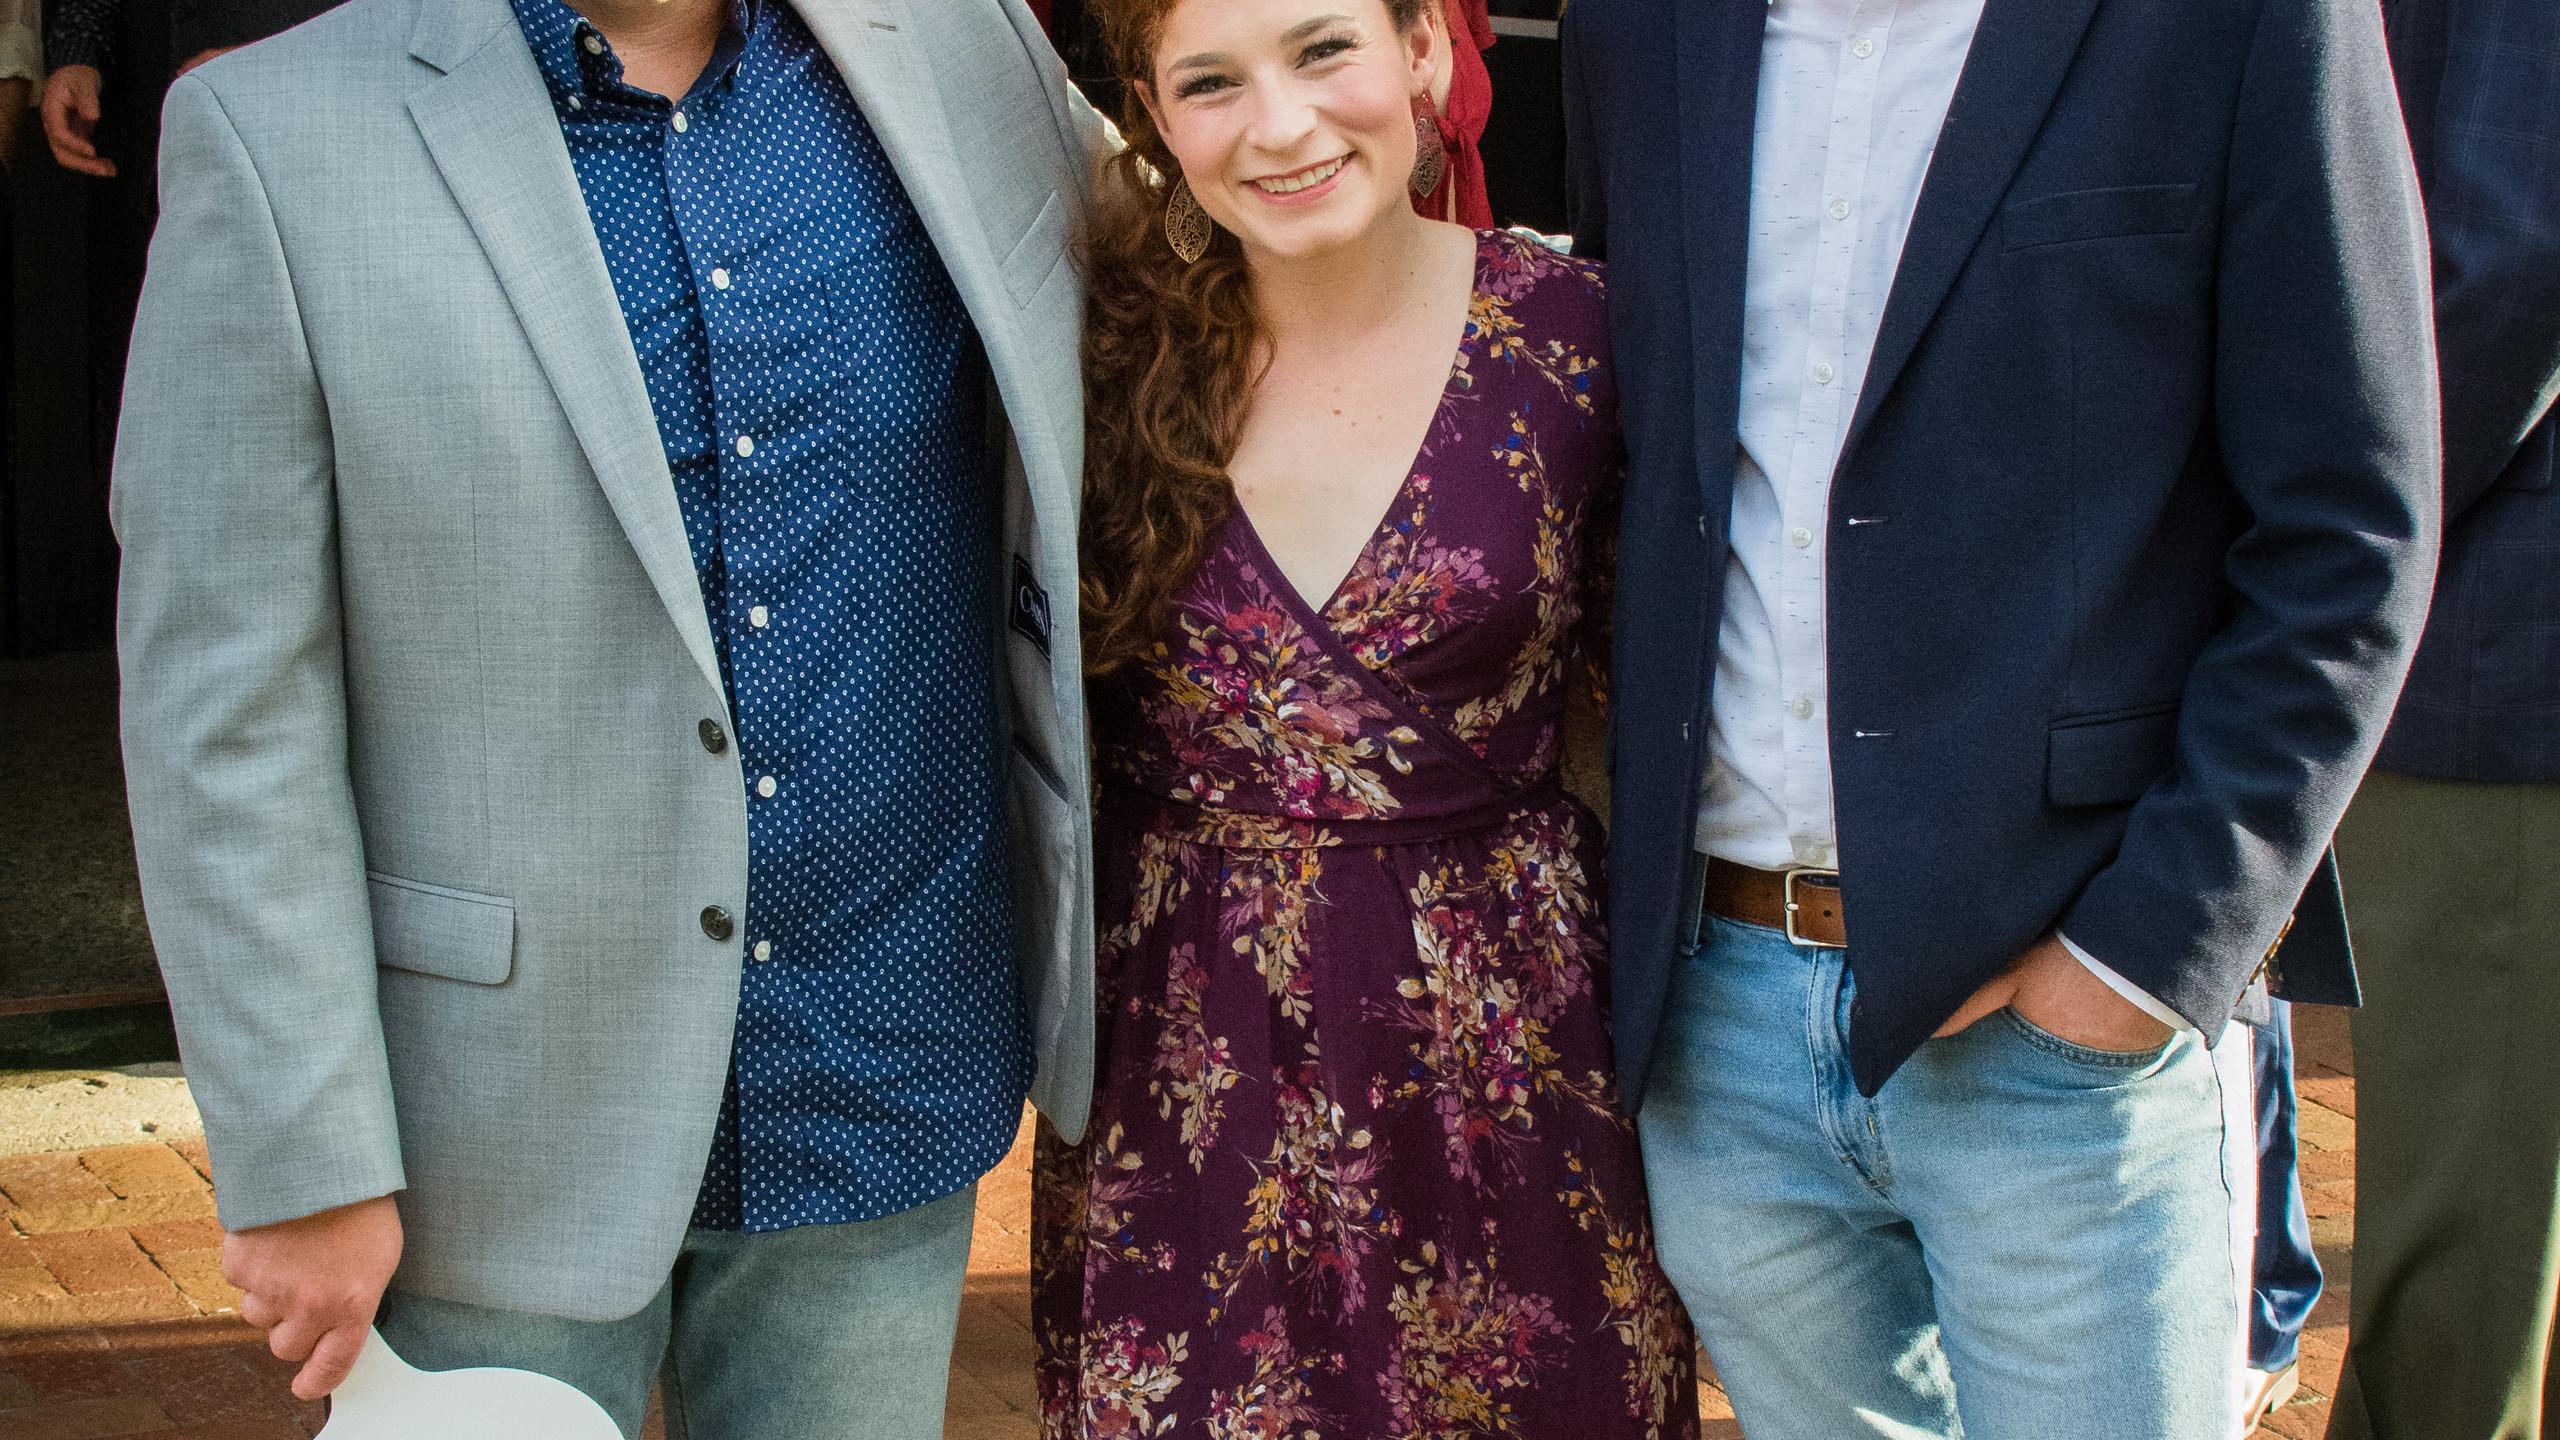 Anthony Johnson, Kelly Latourneao, and T